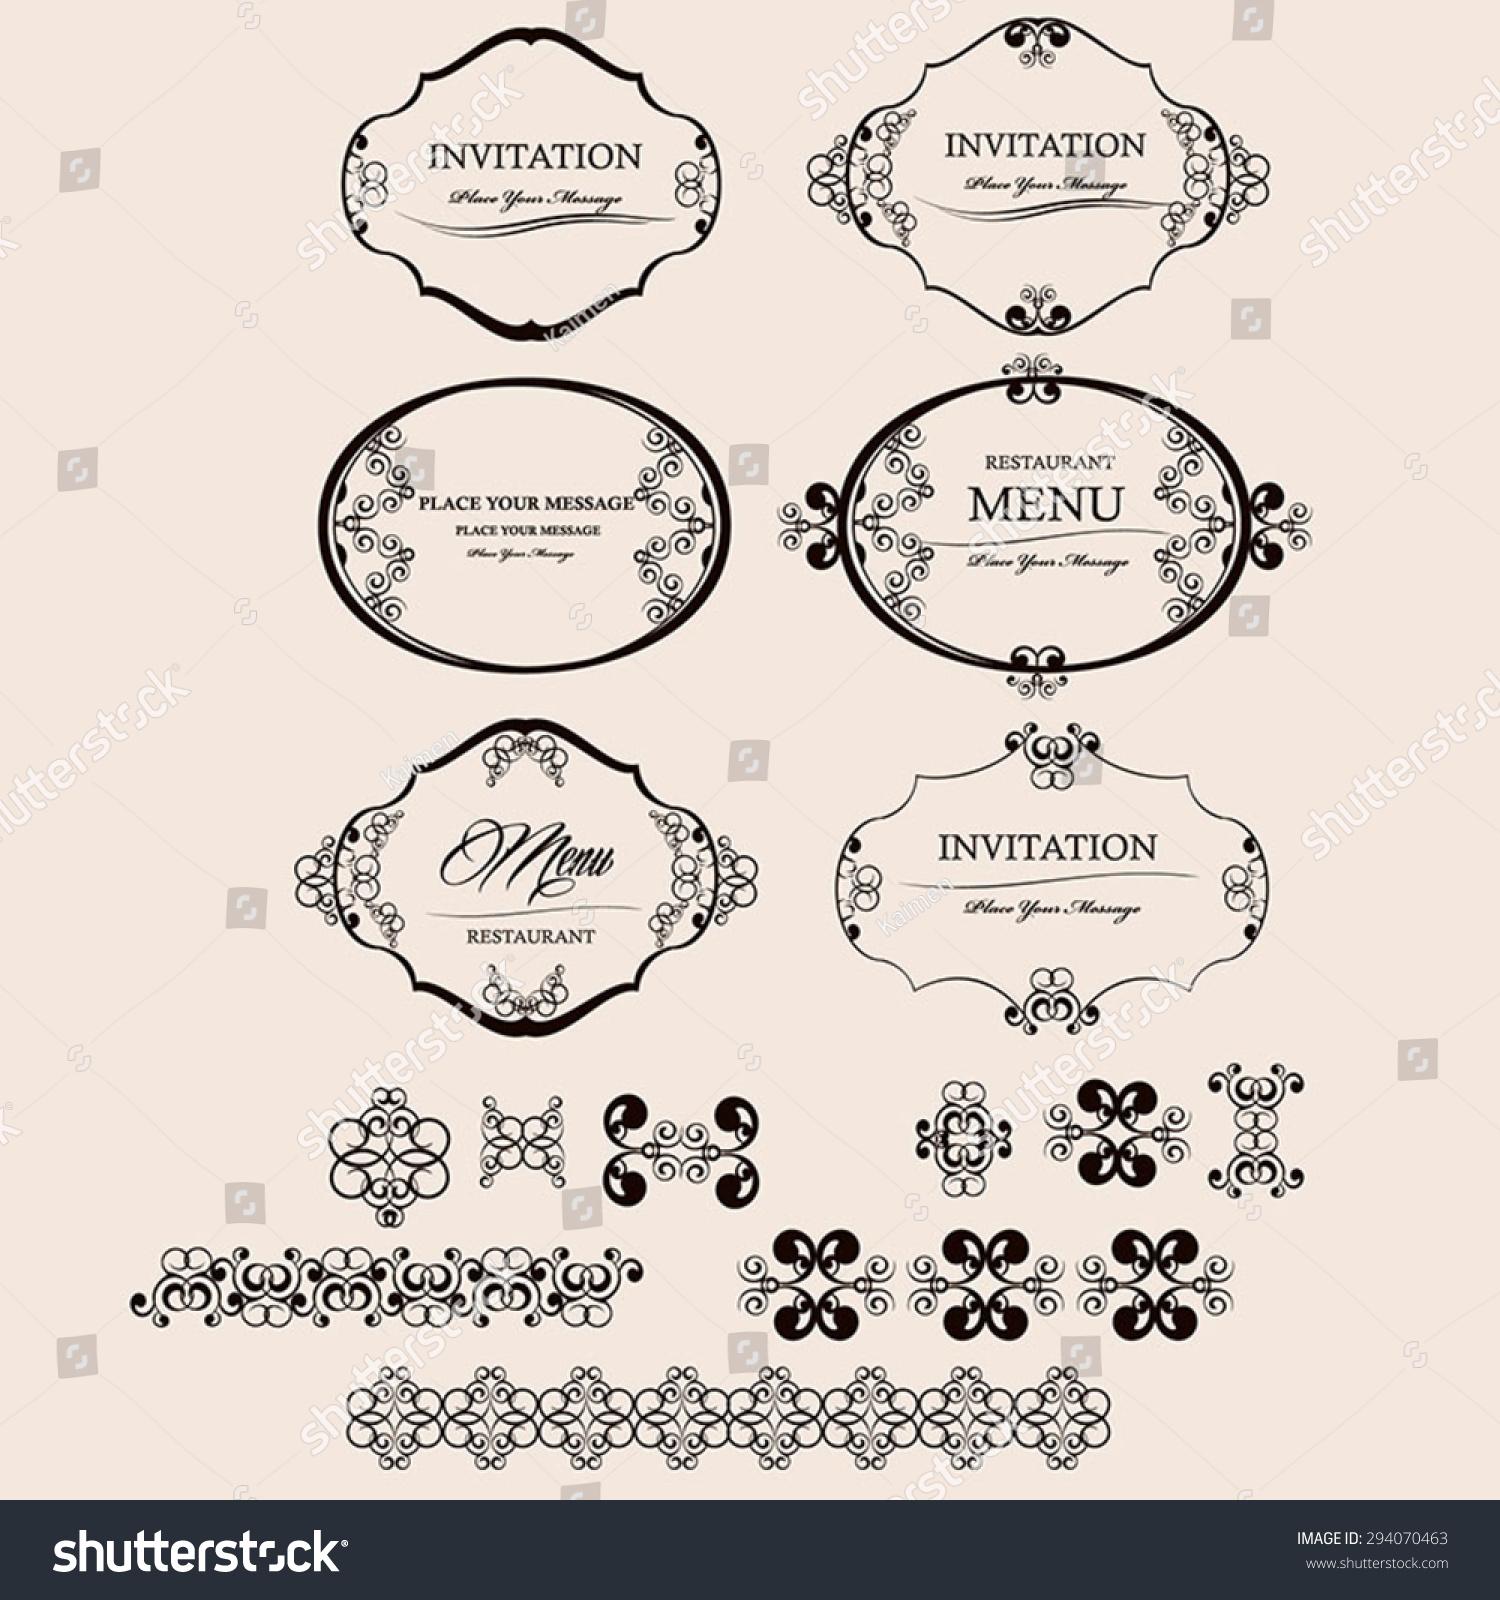 Vector Set Decorative Design Elements Page Stock Vector HD Royalty